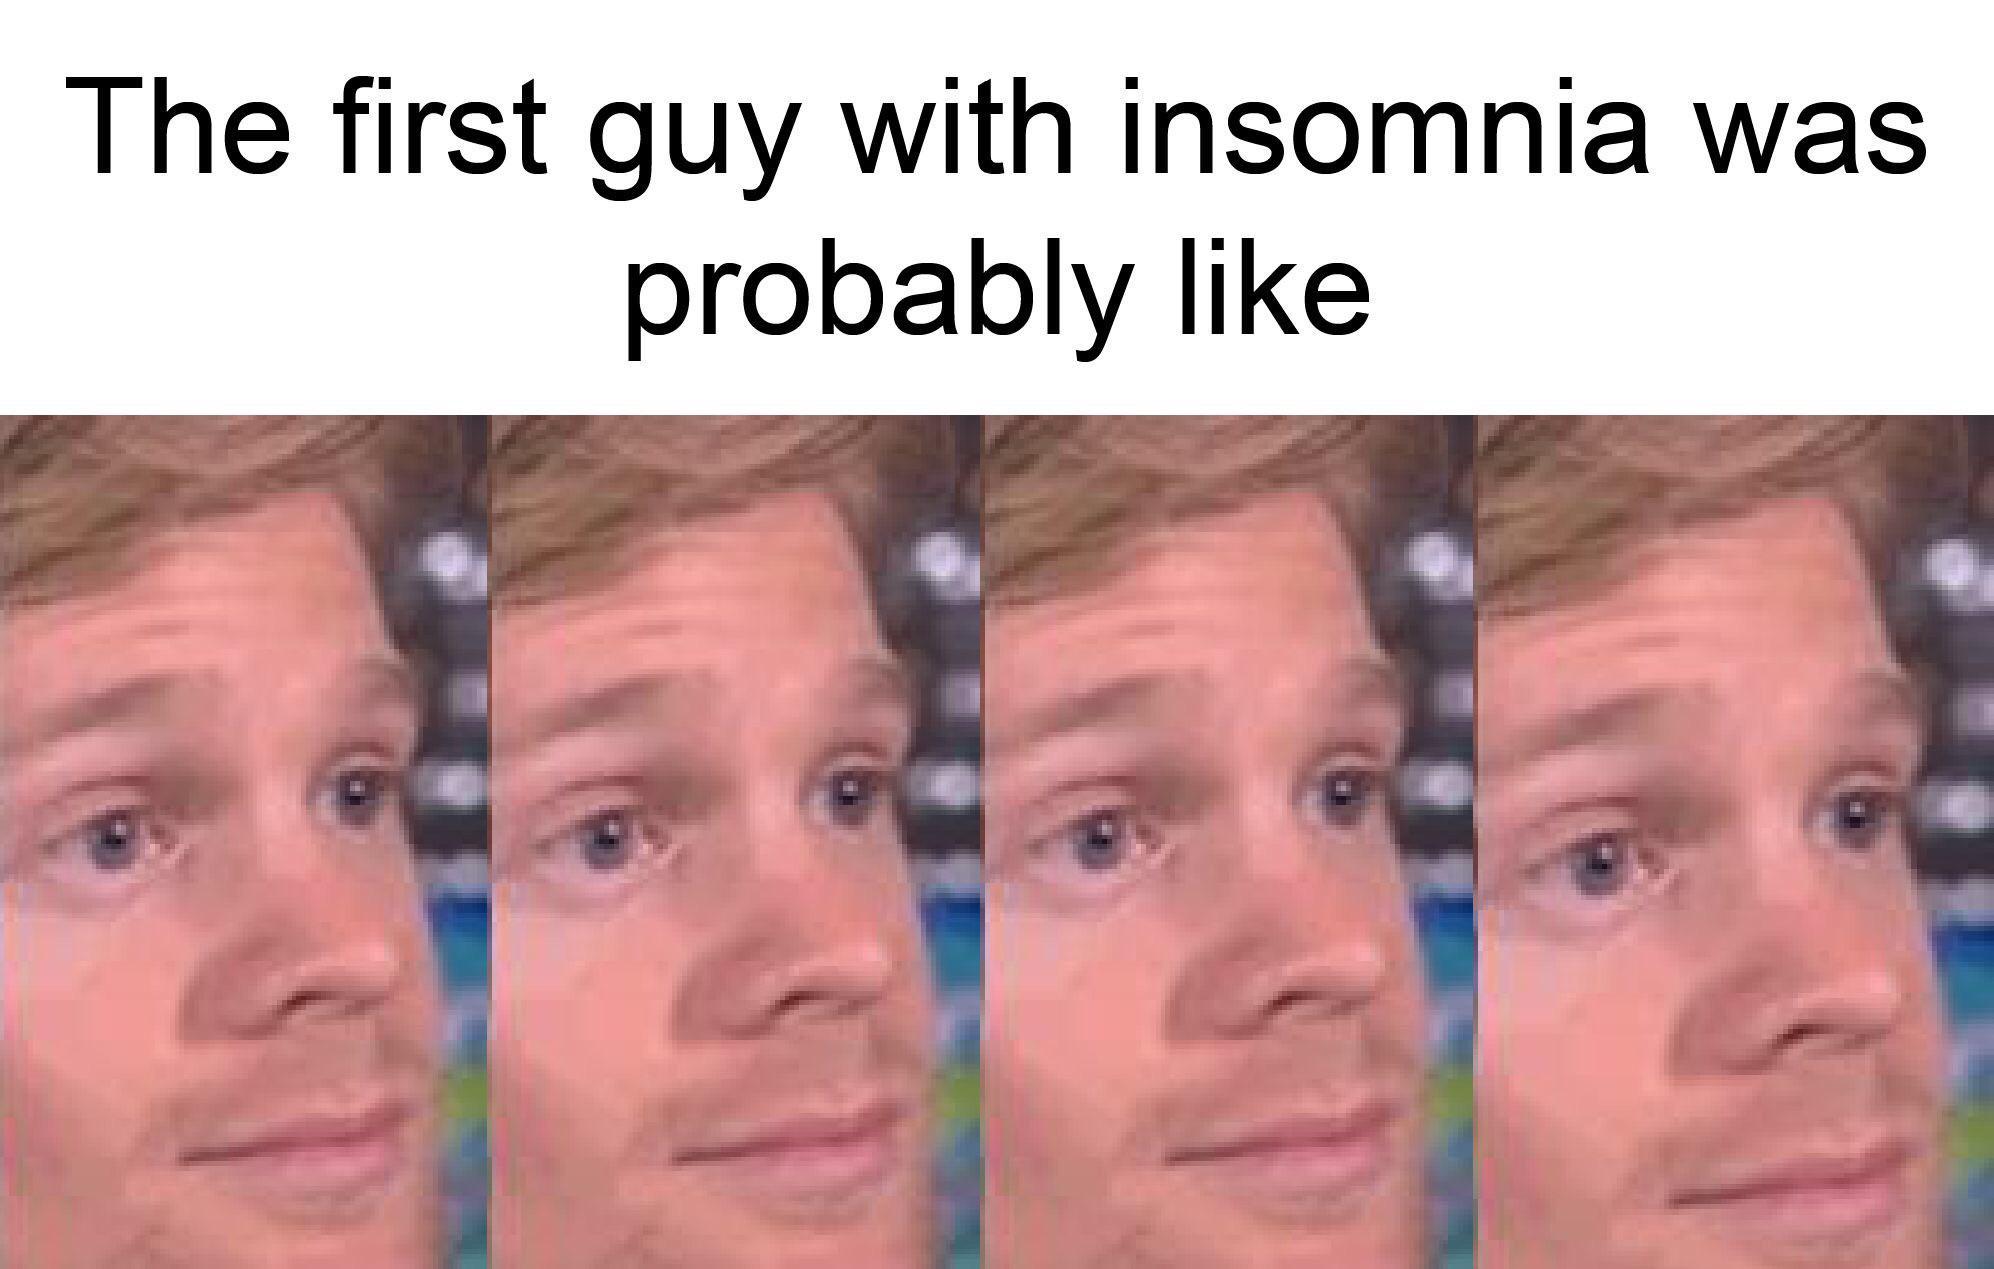 can't sleep, can't sleep memes, insomnia memes, funny memes about insomnia, funny memes about can't sleep